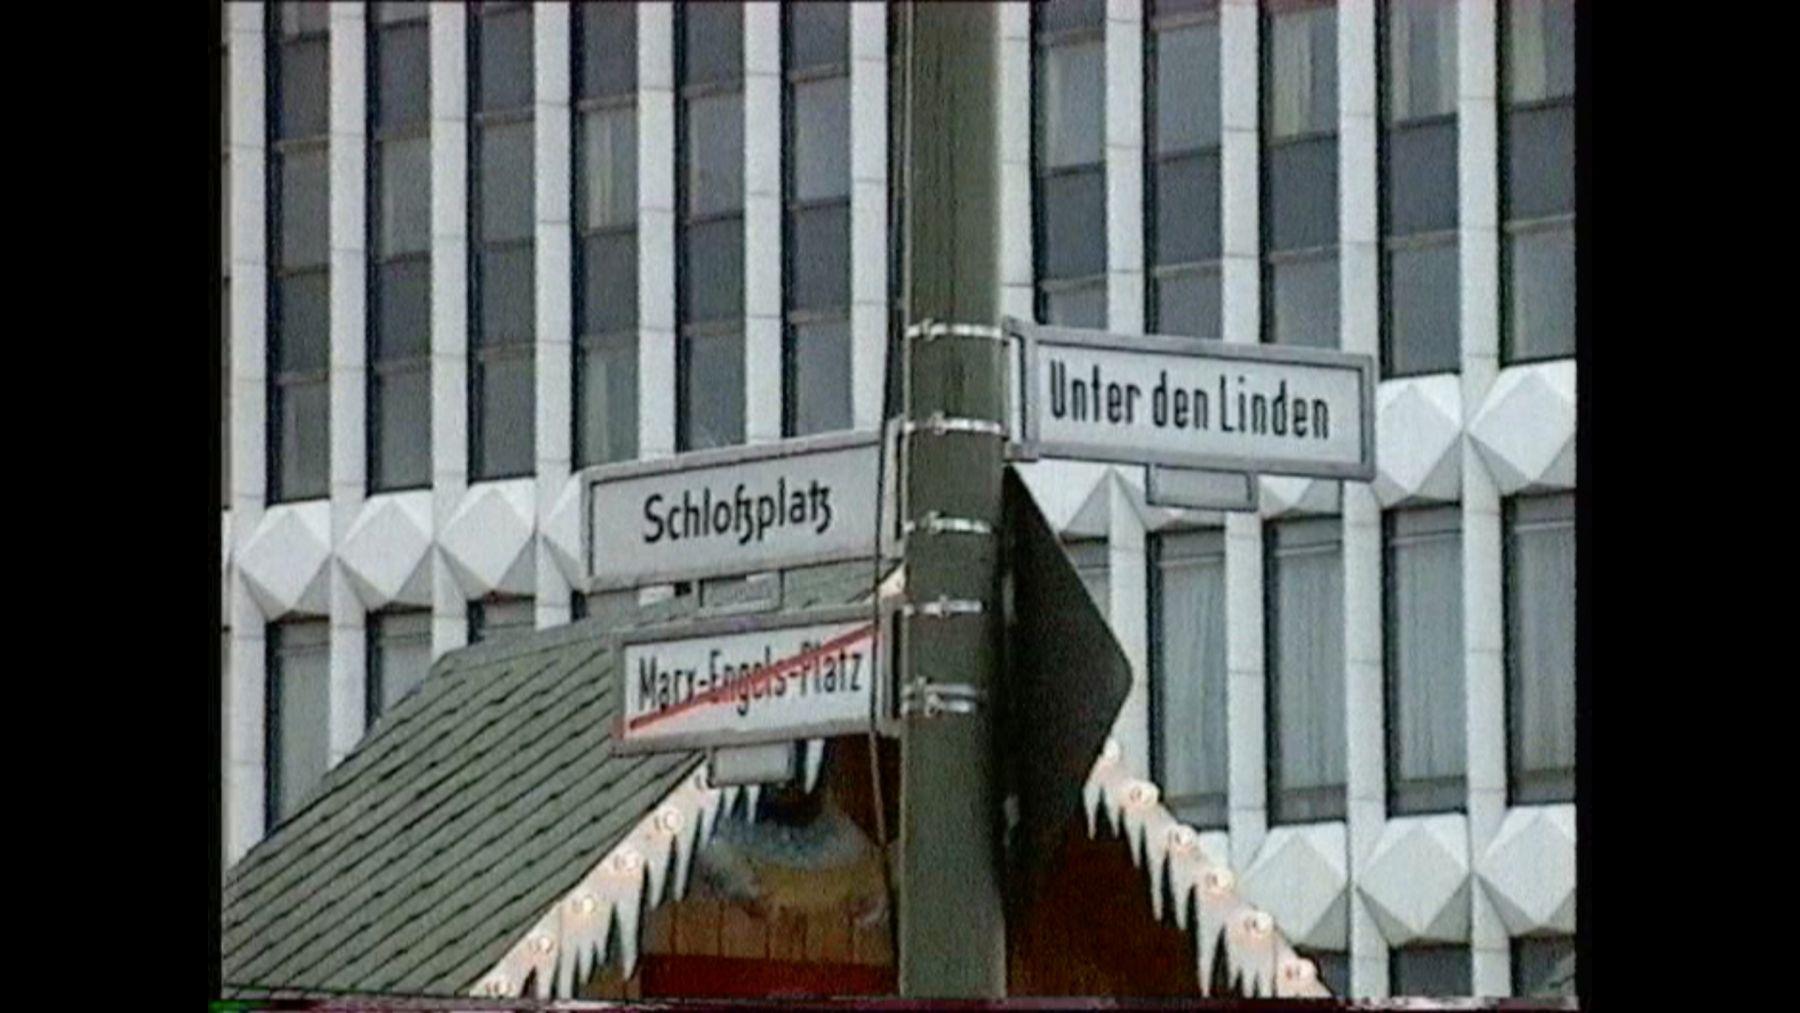 Hito Steyerl The Empty Center, 1998